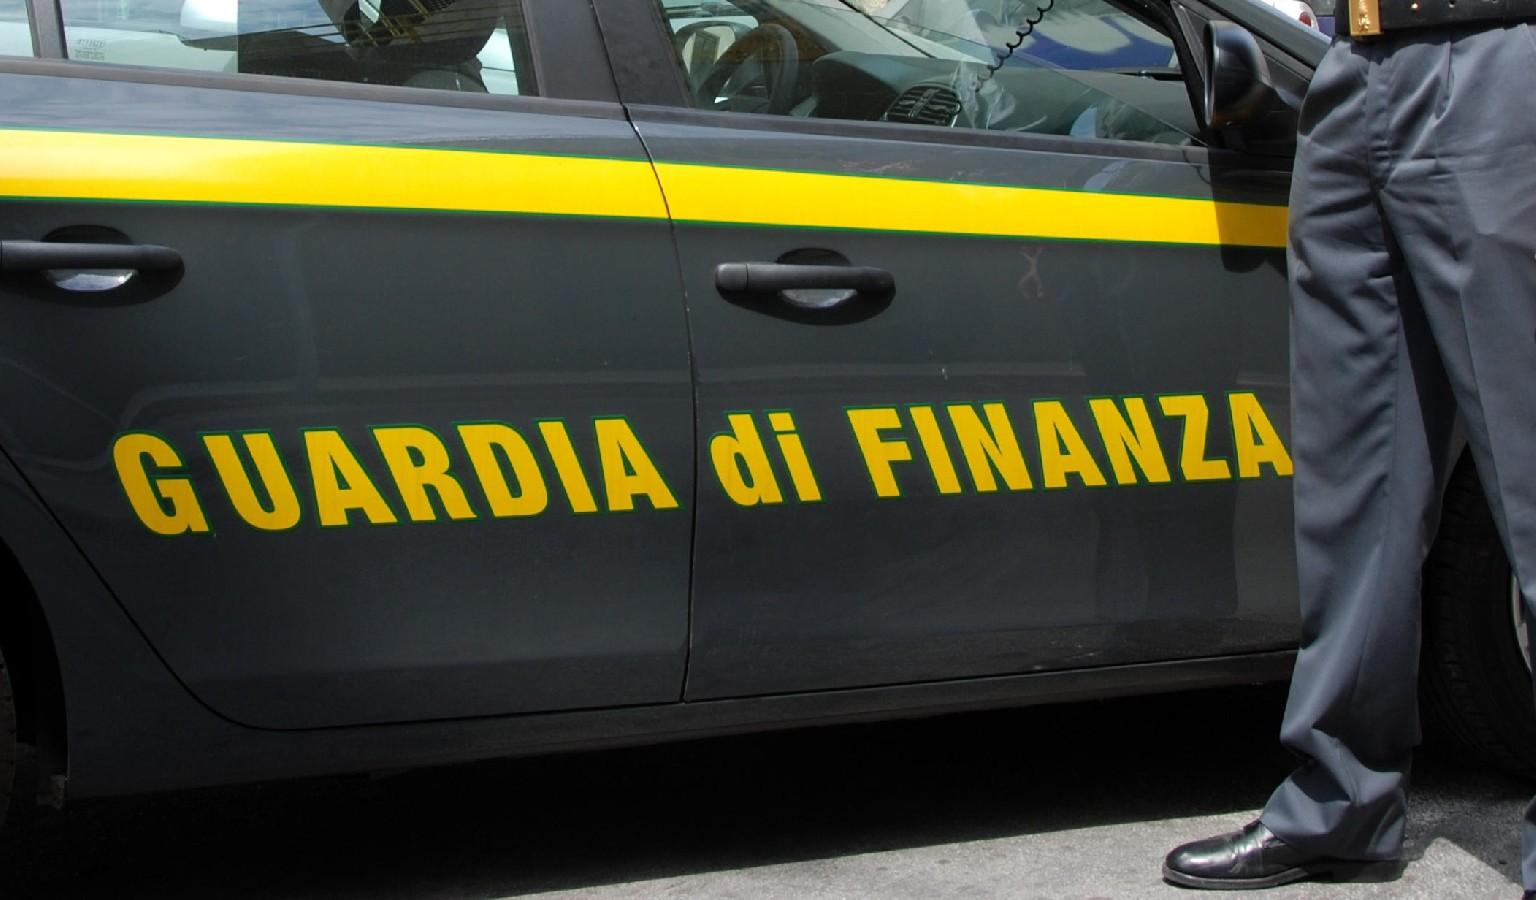 Truffa da 800mila euro: false assunzioni